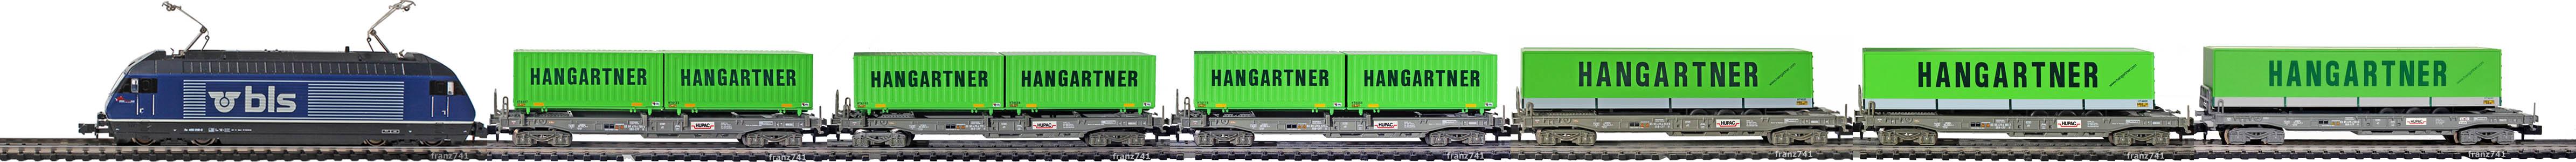 Epoche-V-SBB-BLS-Zugskomposition-HUPAC-Hangartner-Taschenwagen-Gueterzug-Typ-Sdgmss